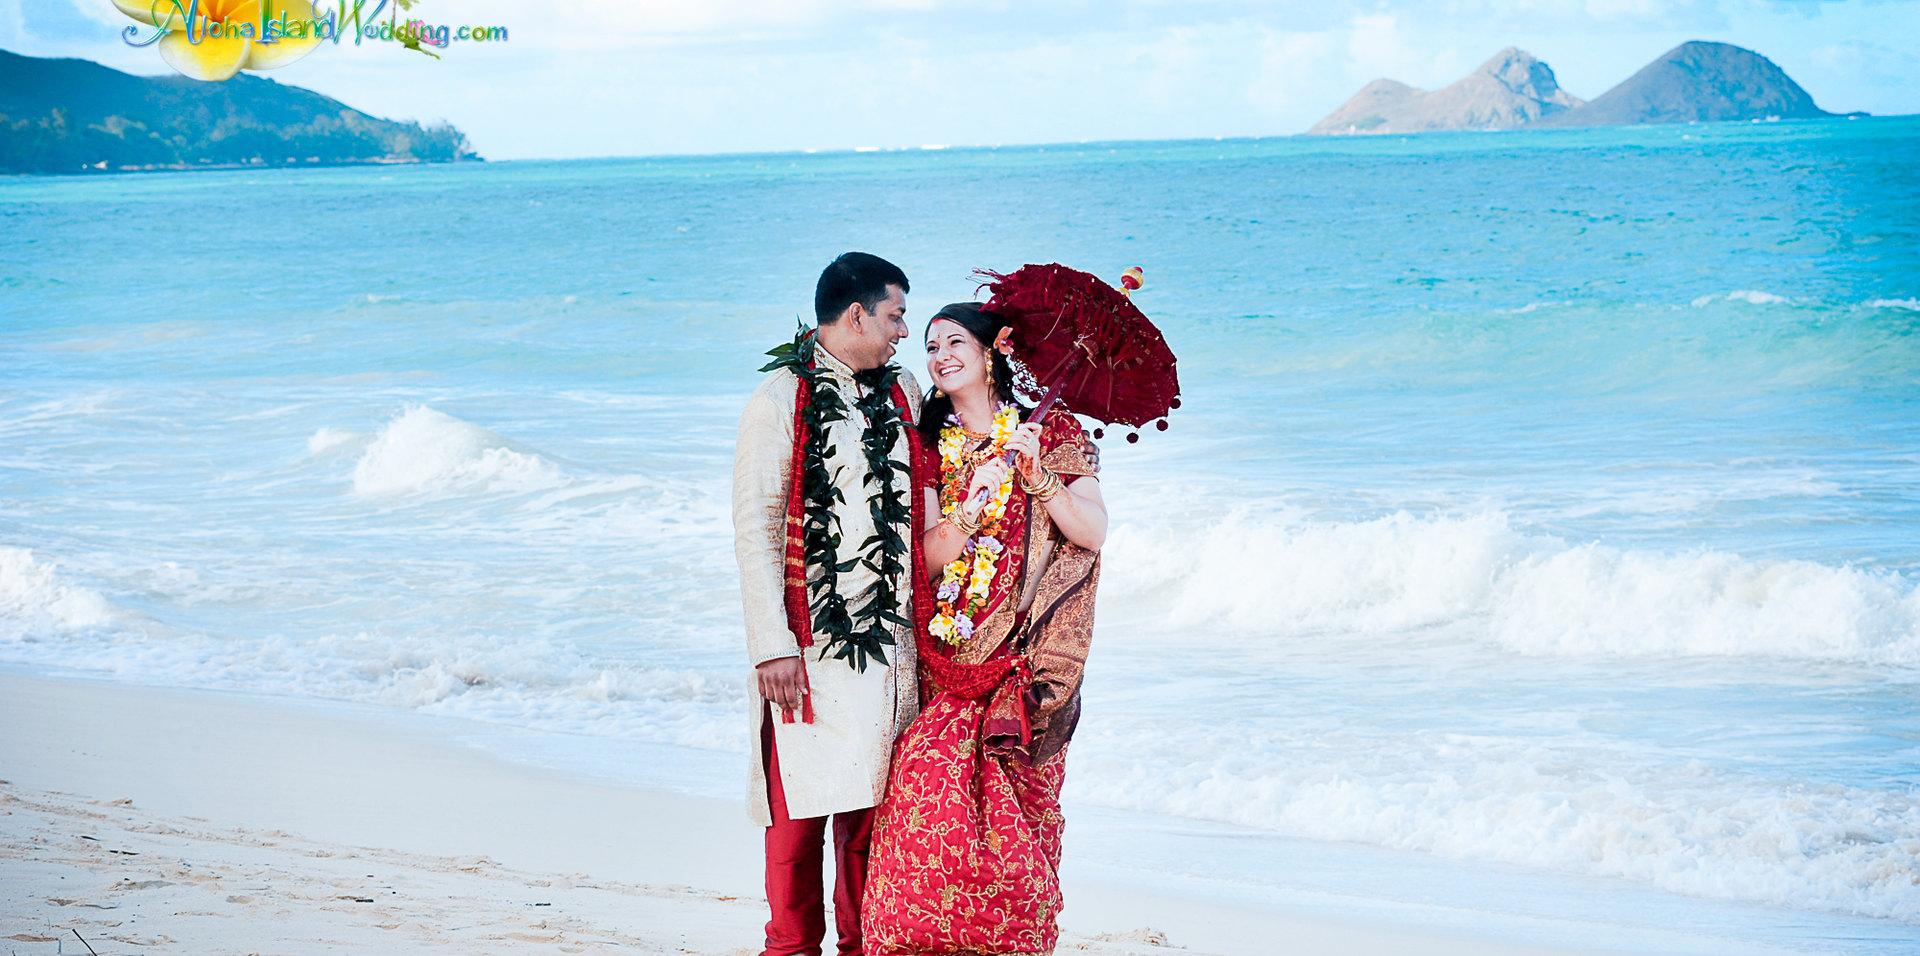 Indian wedding ceremony in hawaii-242.jp